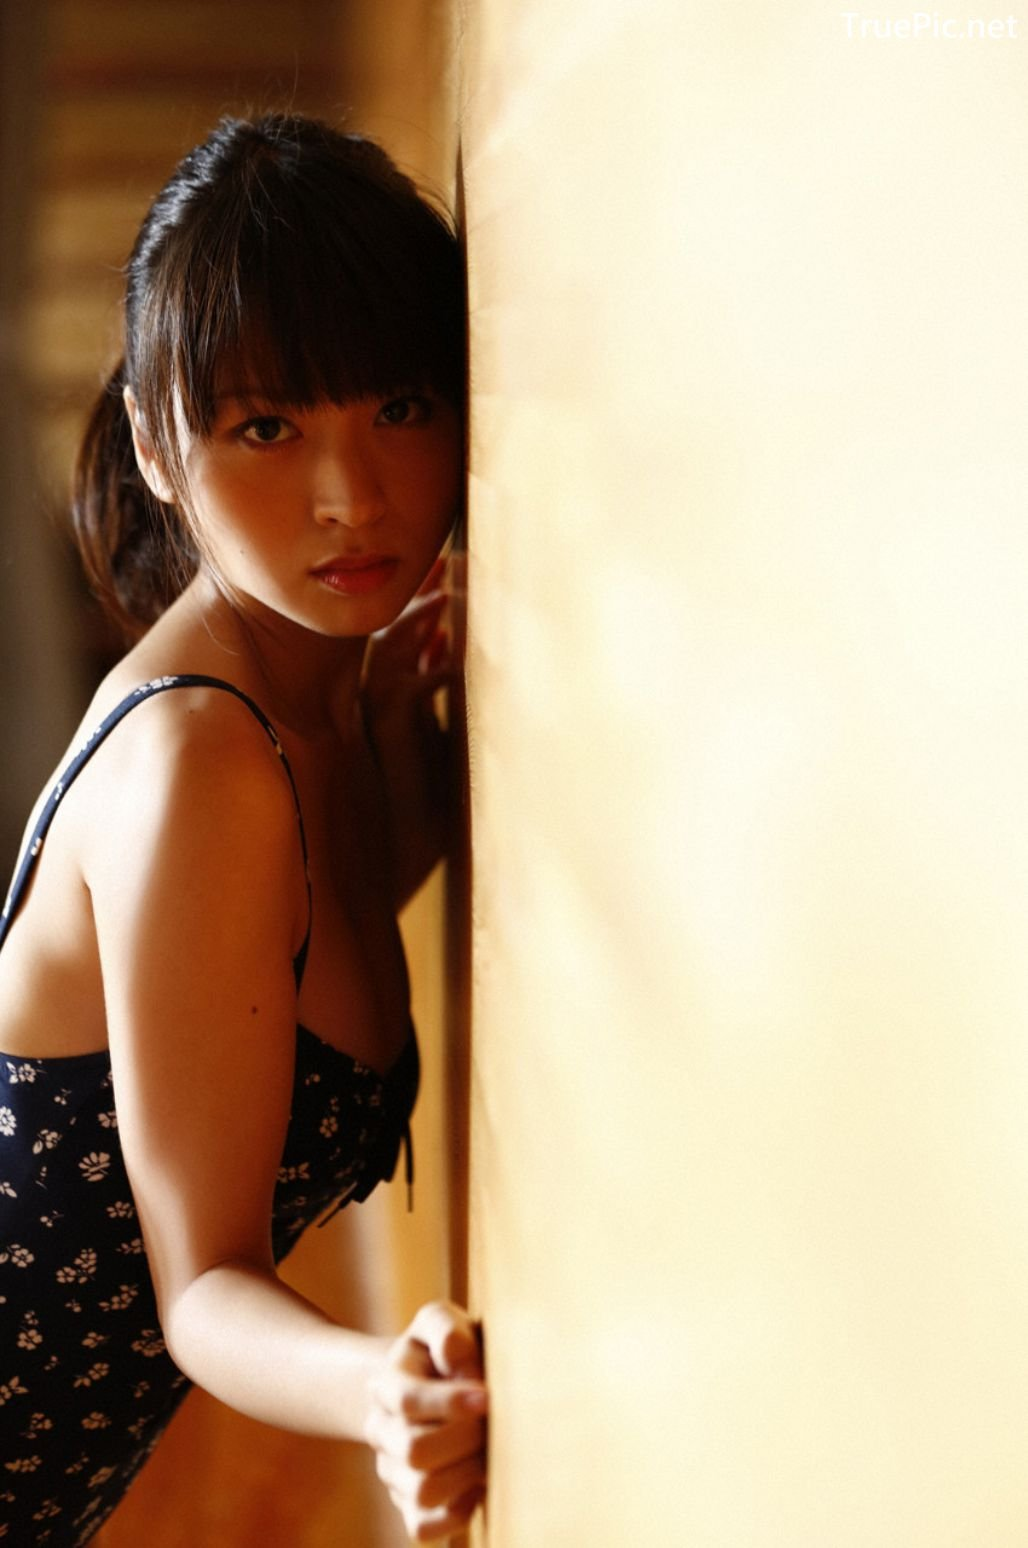 Image-Japanese-Gravure-Idol-Mio-Otani-Photos-Purity-Miss-Magazine-TruePic.net- Picture-2